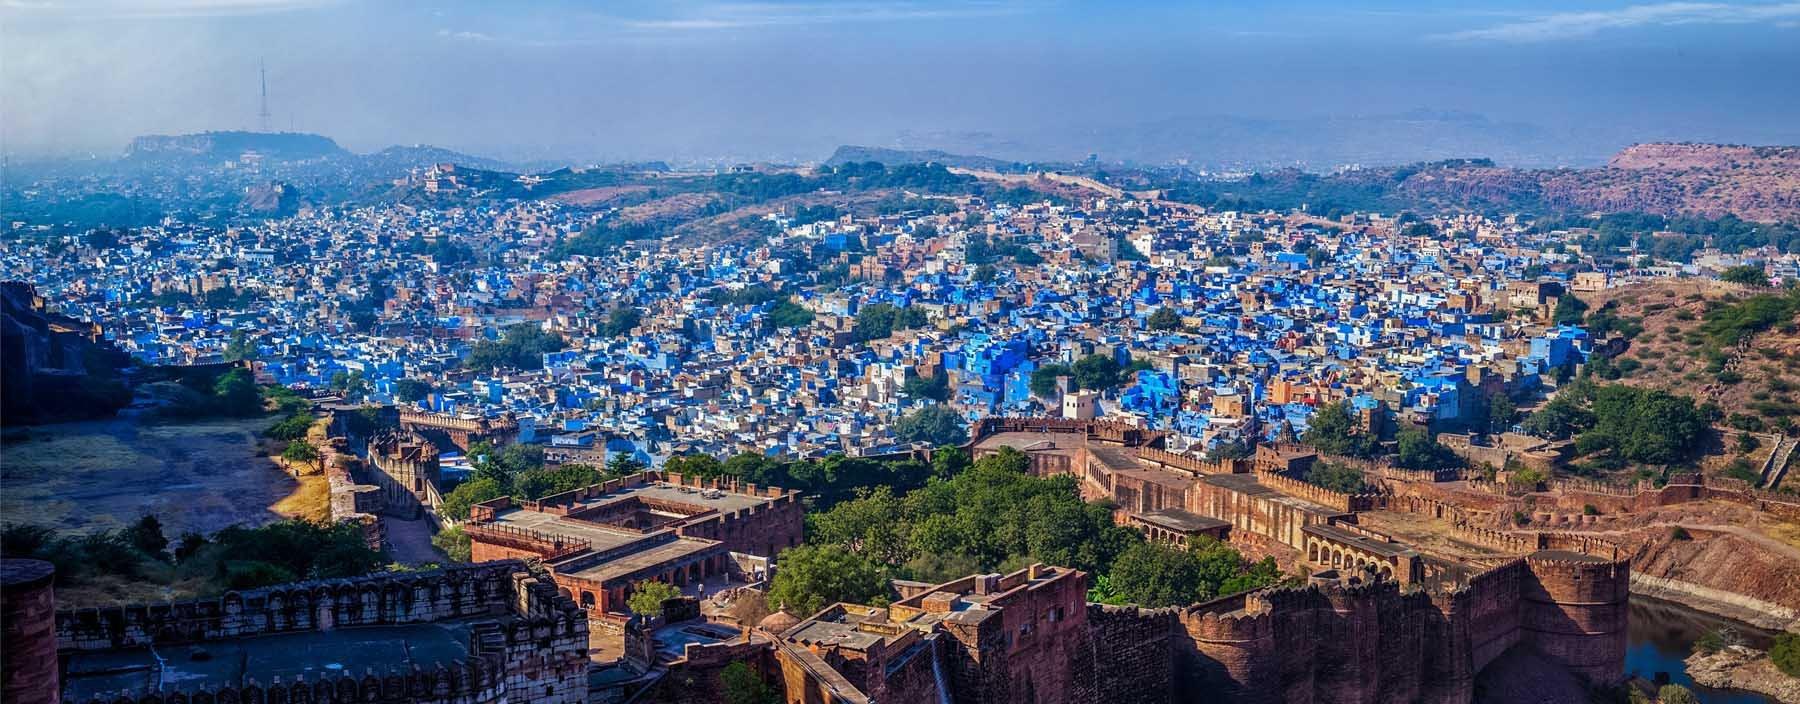 in, jodhpur, jodhpur, also known as blue city.jpg